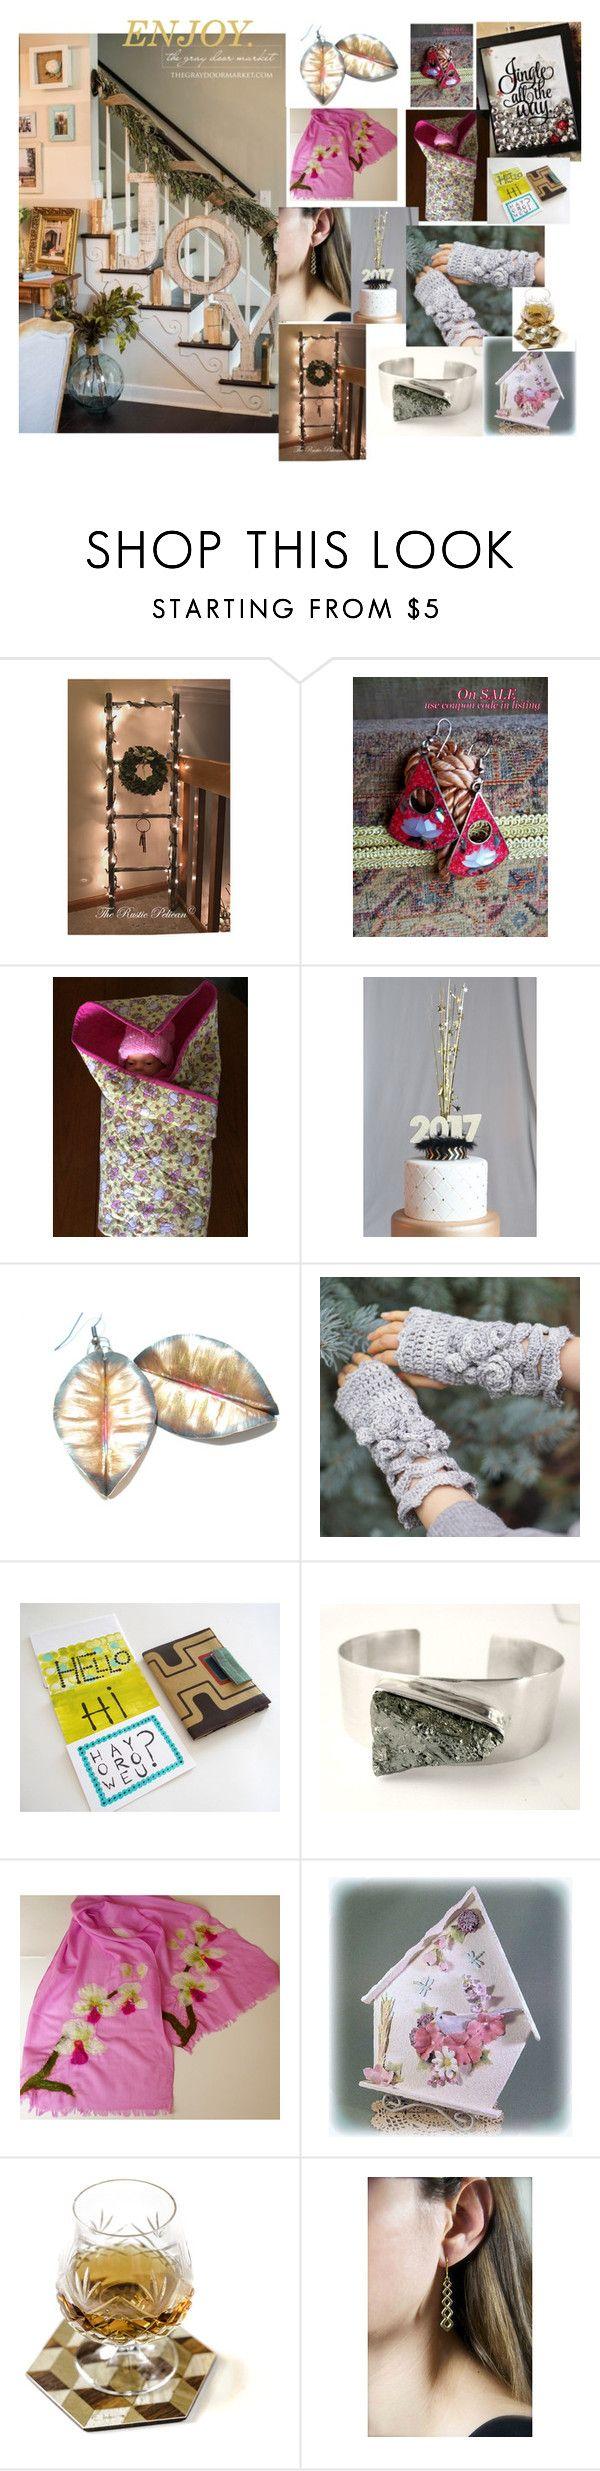 """Enjoy Christmas shopping."" by stavrosdragatakis ❤ liked on Polyvore featuring dragatakisjewellery"